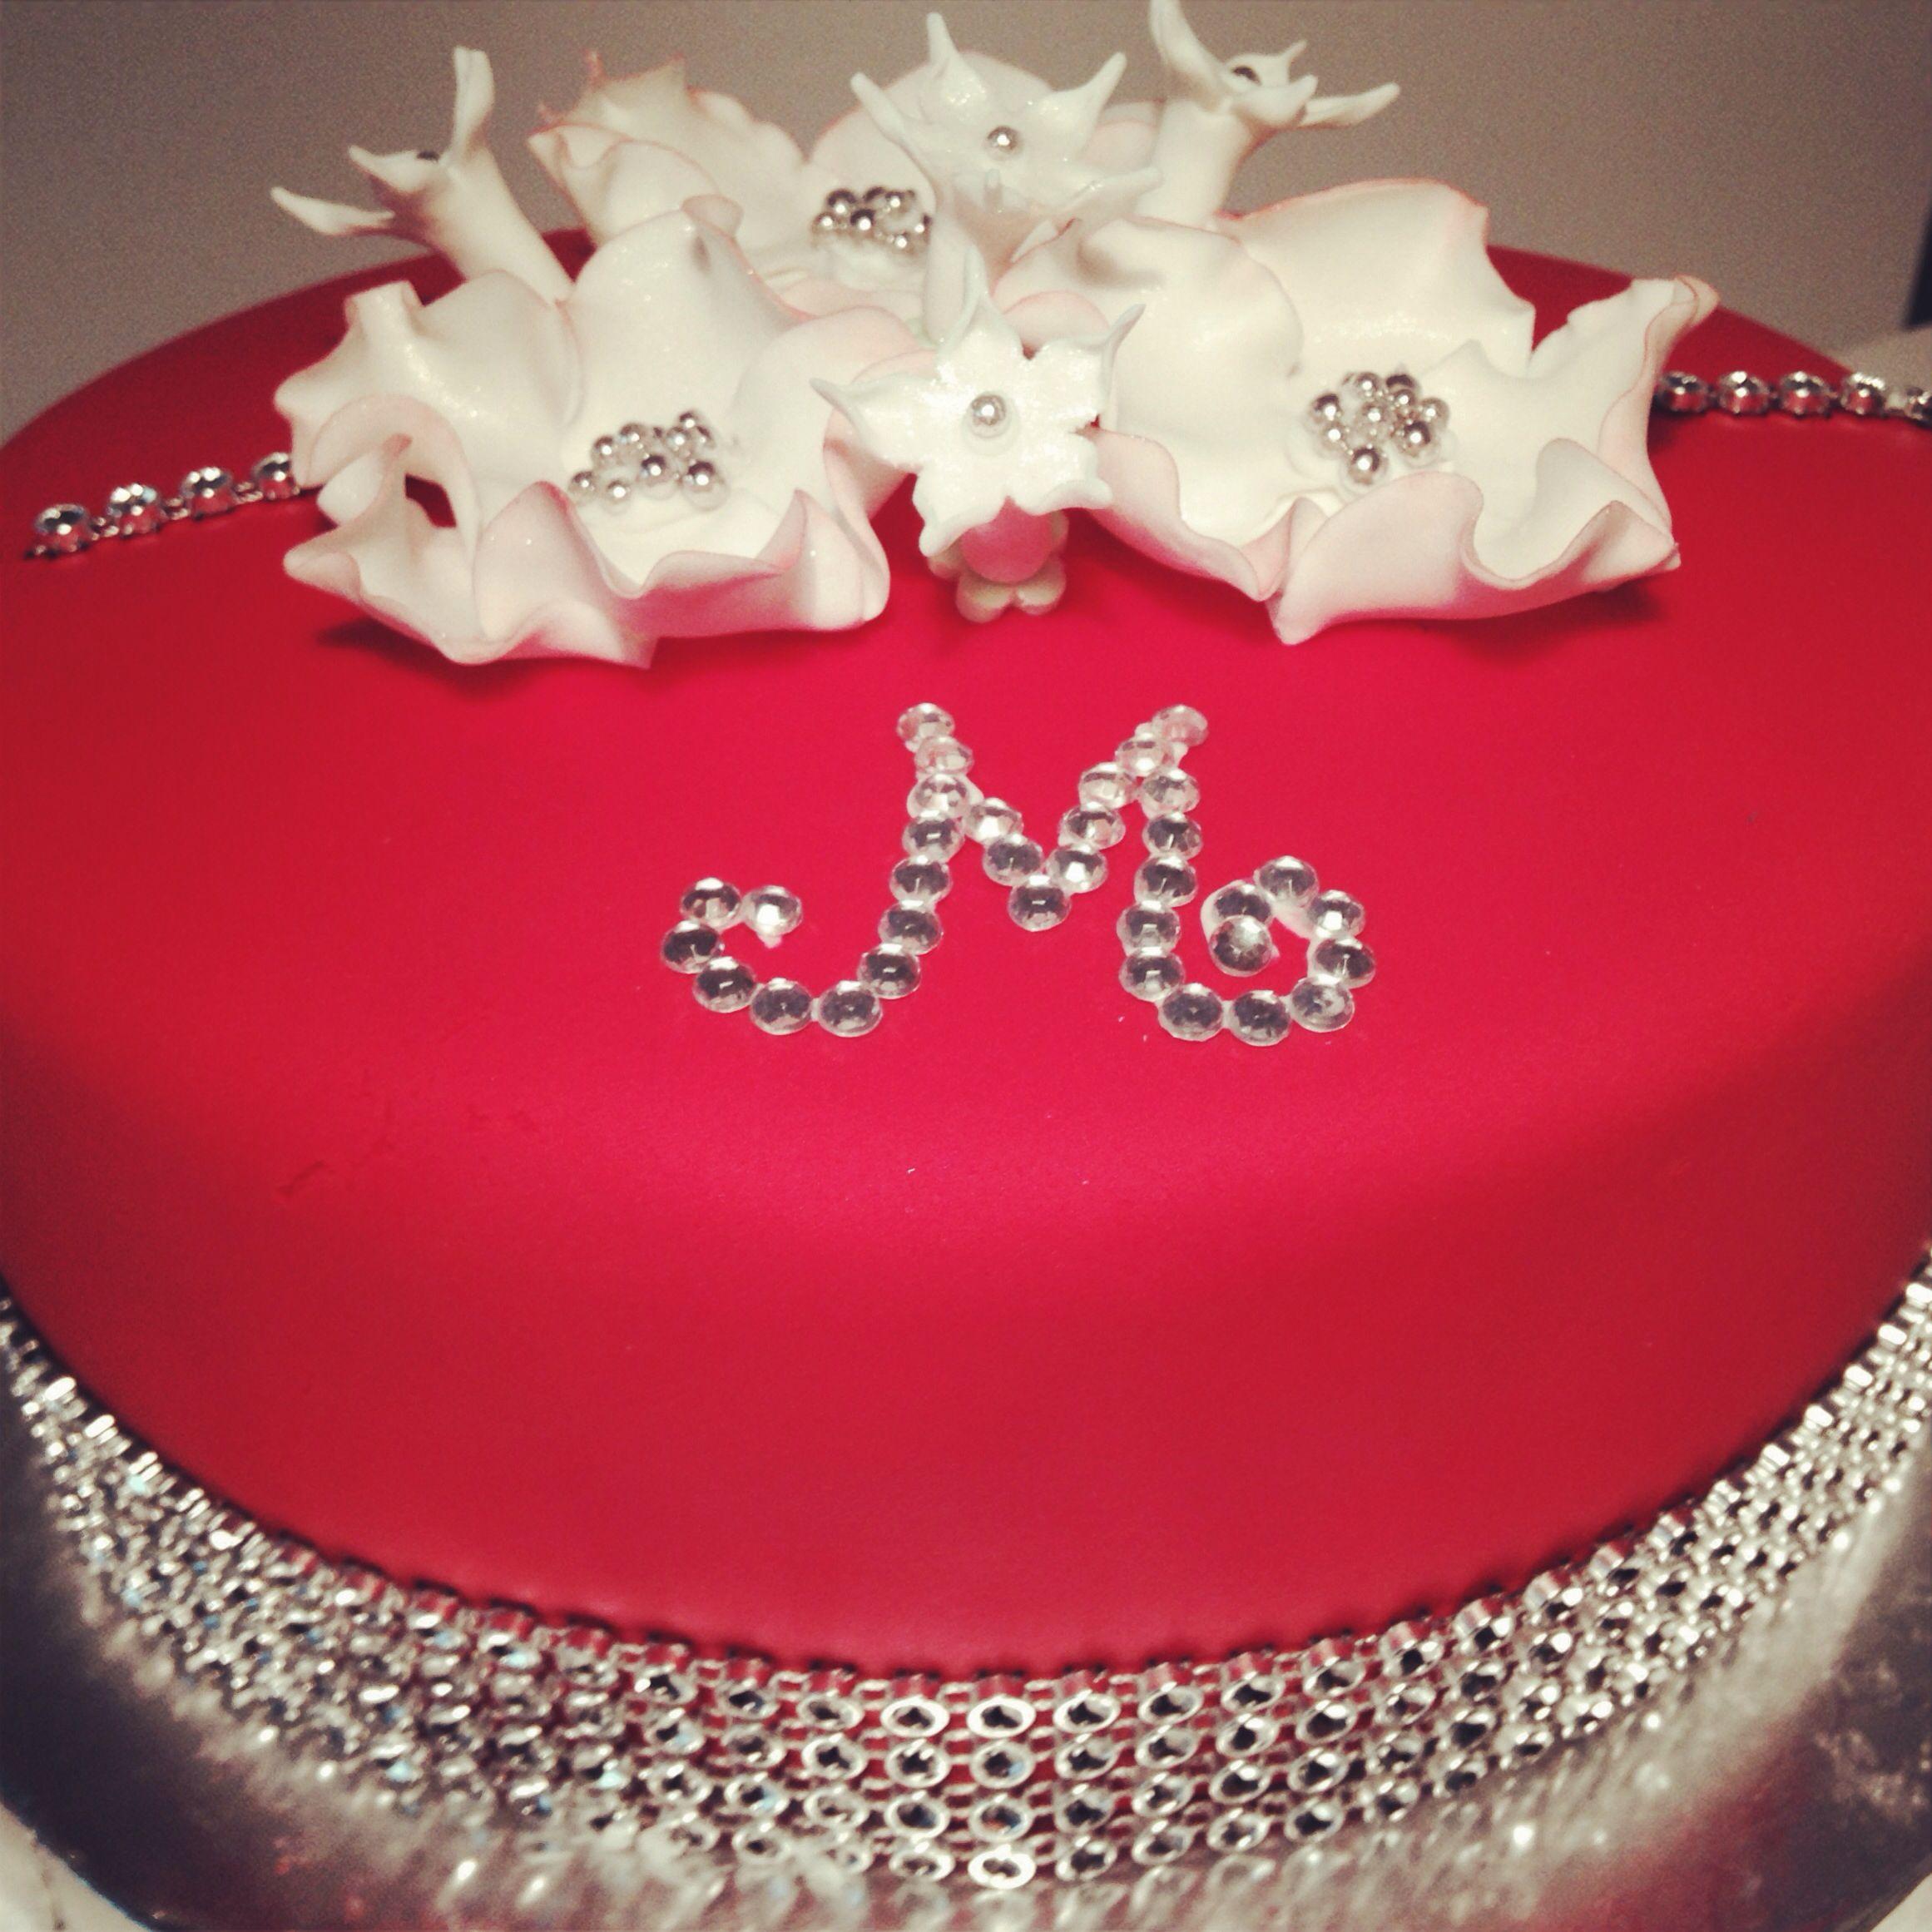 Love My Sparkly Birthday Cake ️